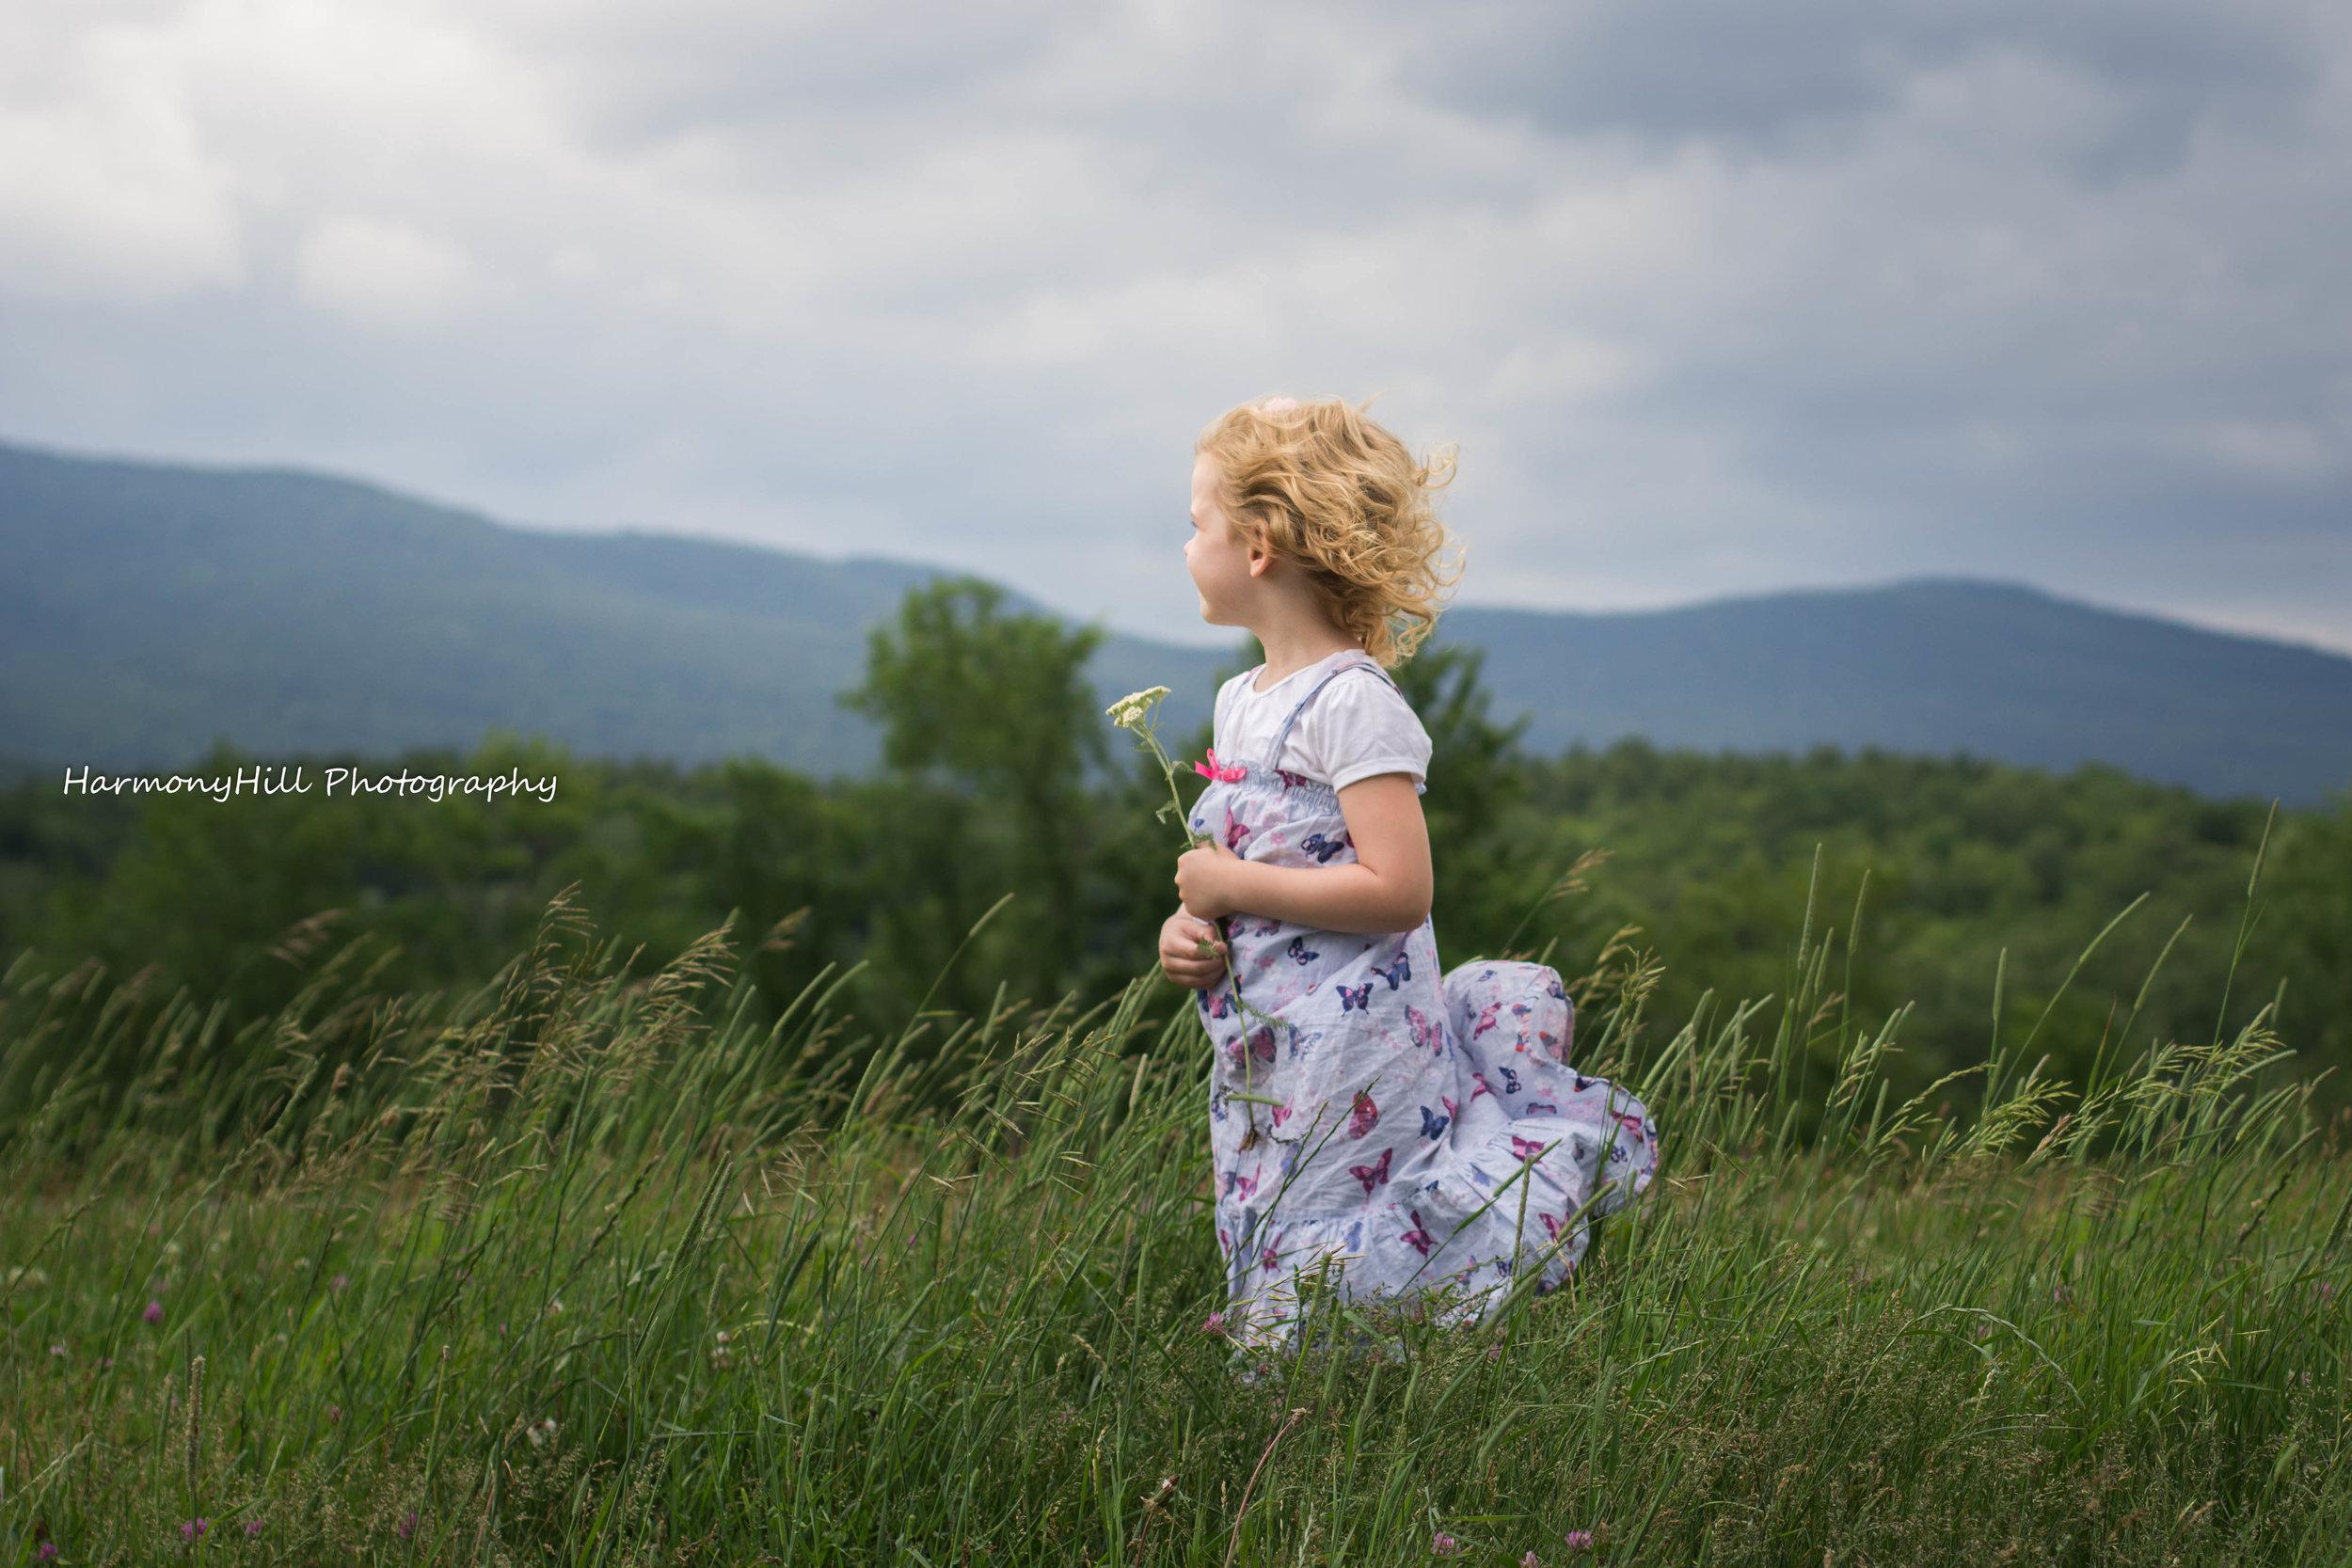 catskill mountains child portrait harmonyhill by christine mcilhenny